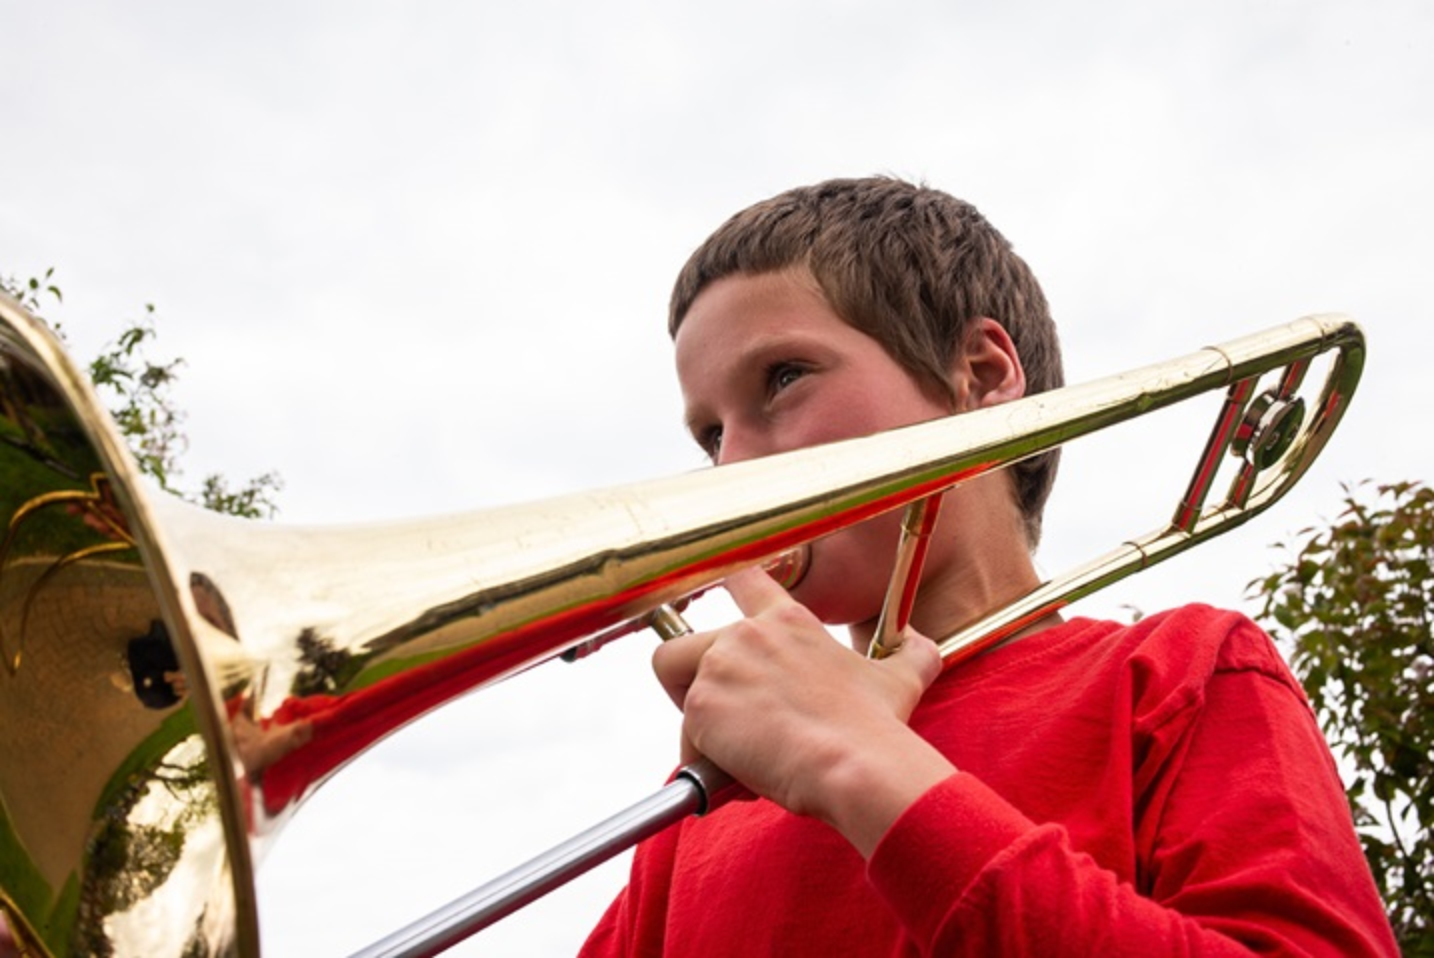 Trombone player at the Darvell Bruderhof